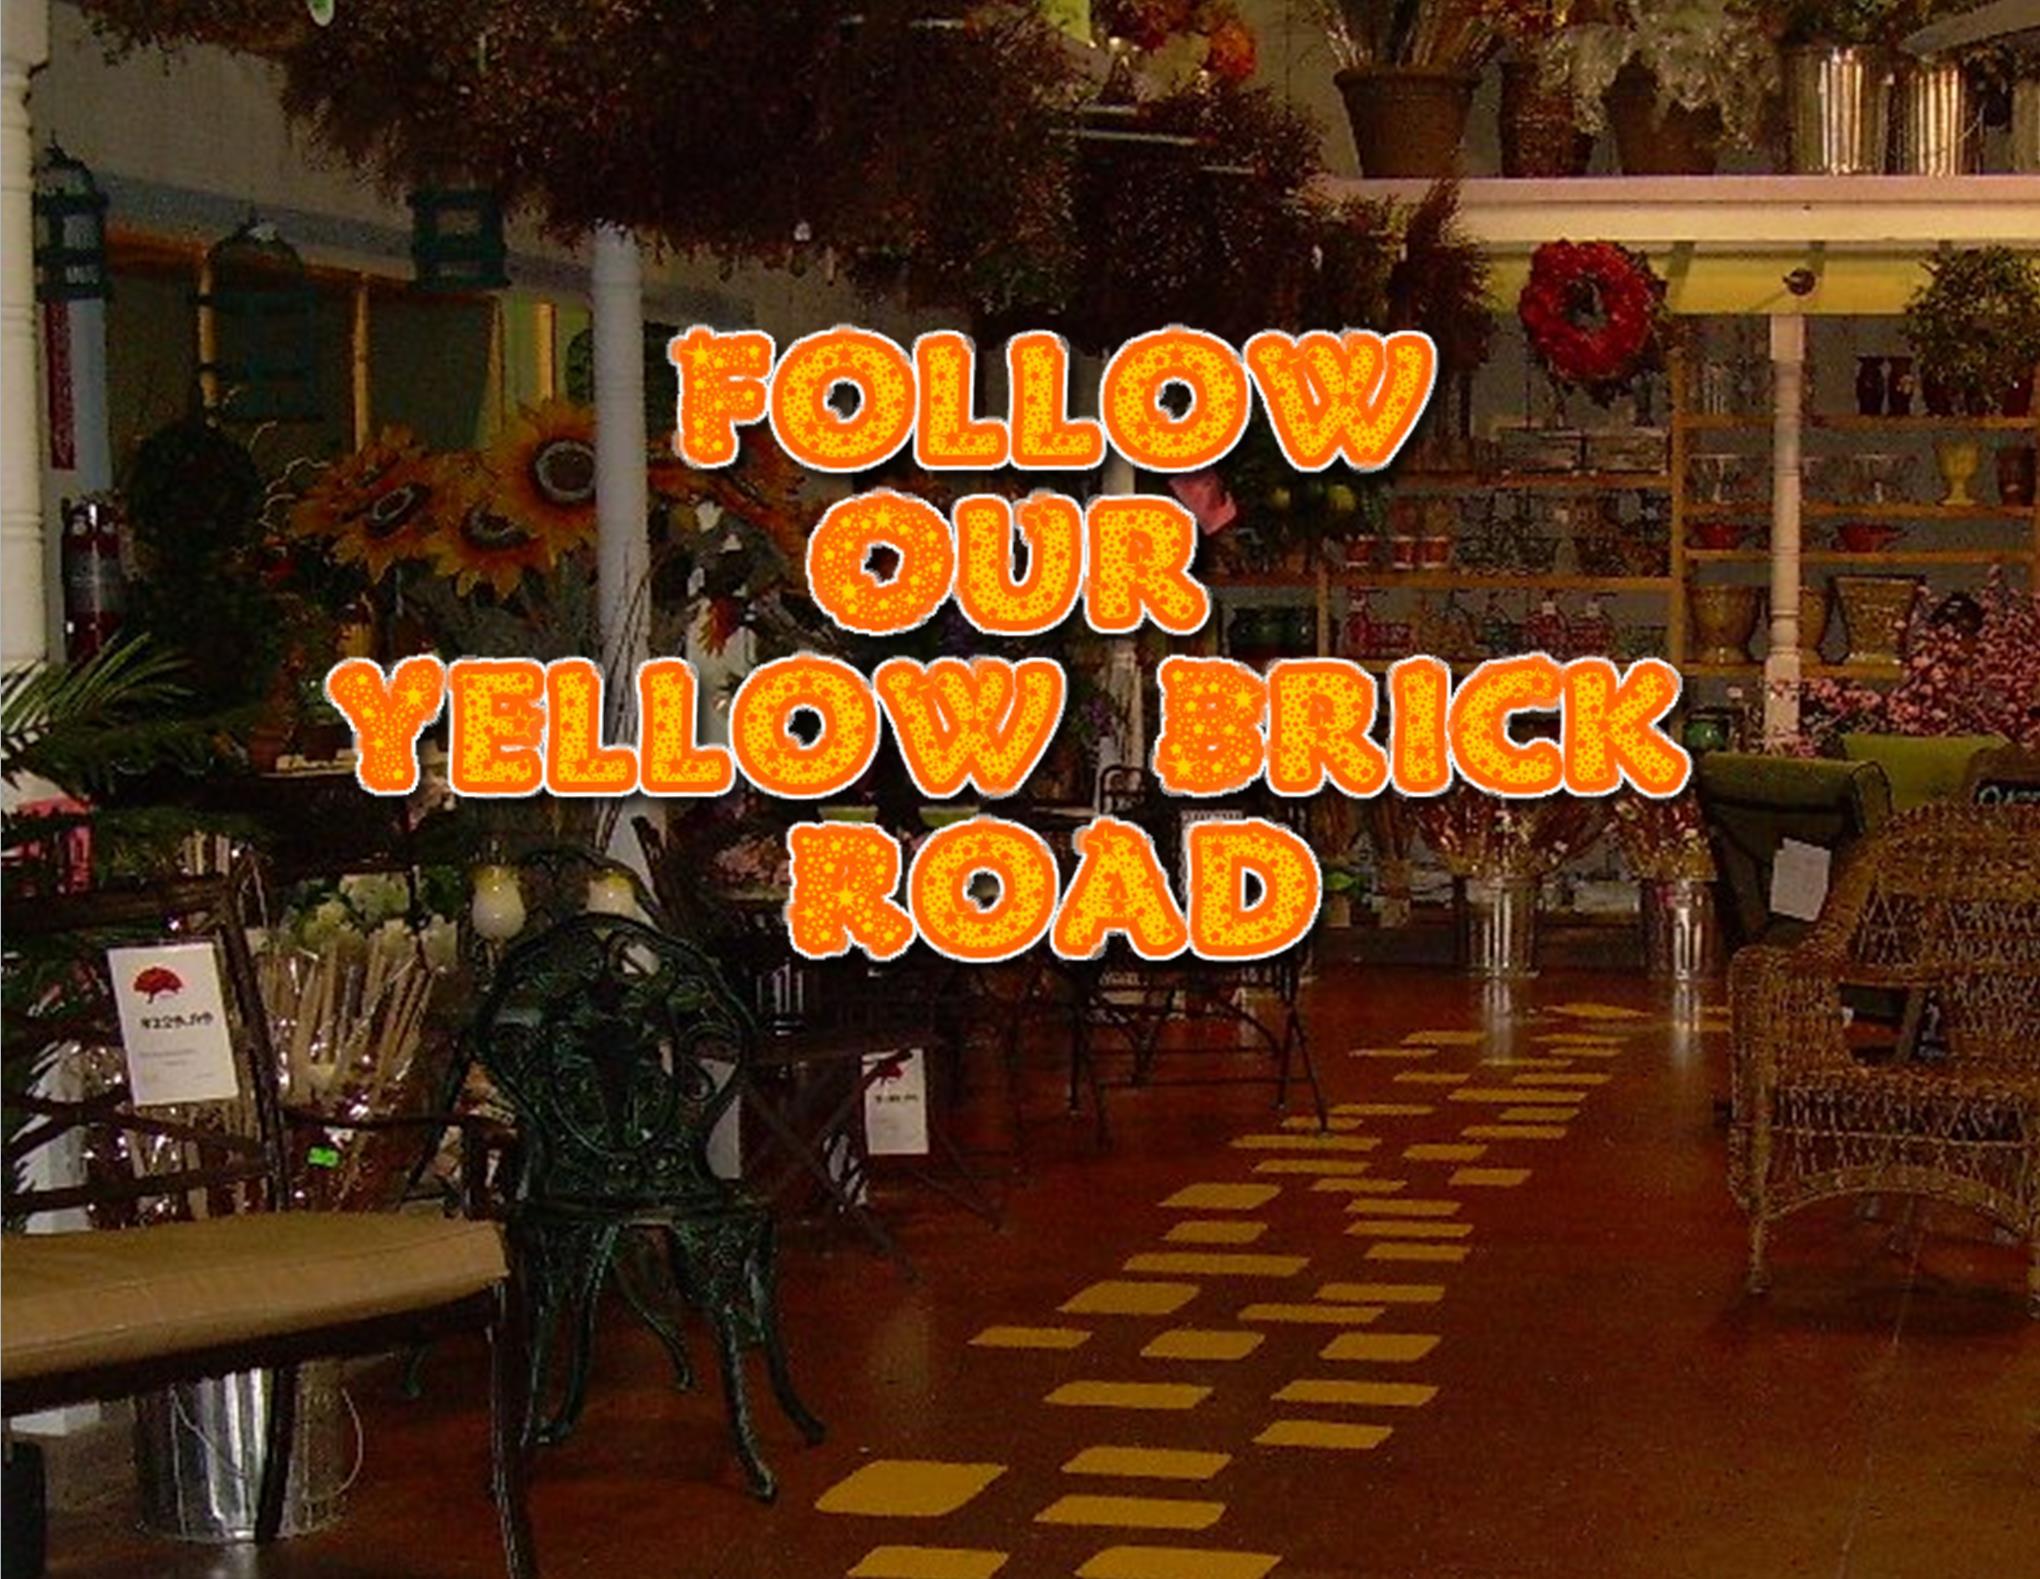 CJ promo yellow brick road